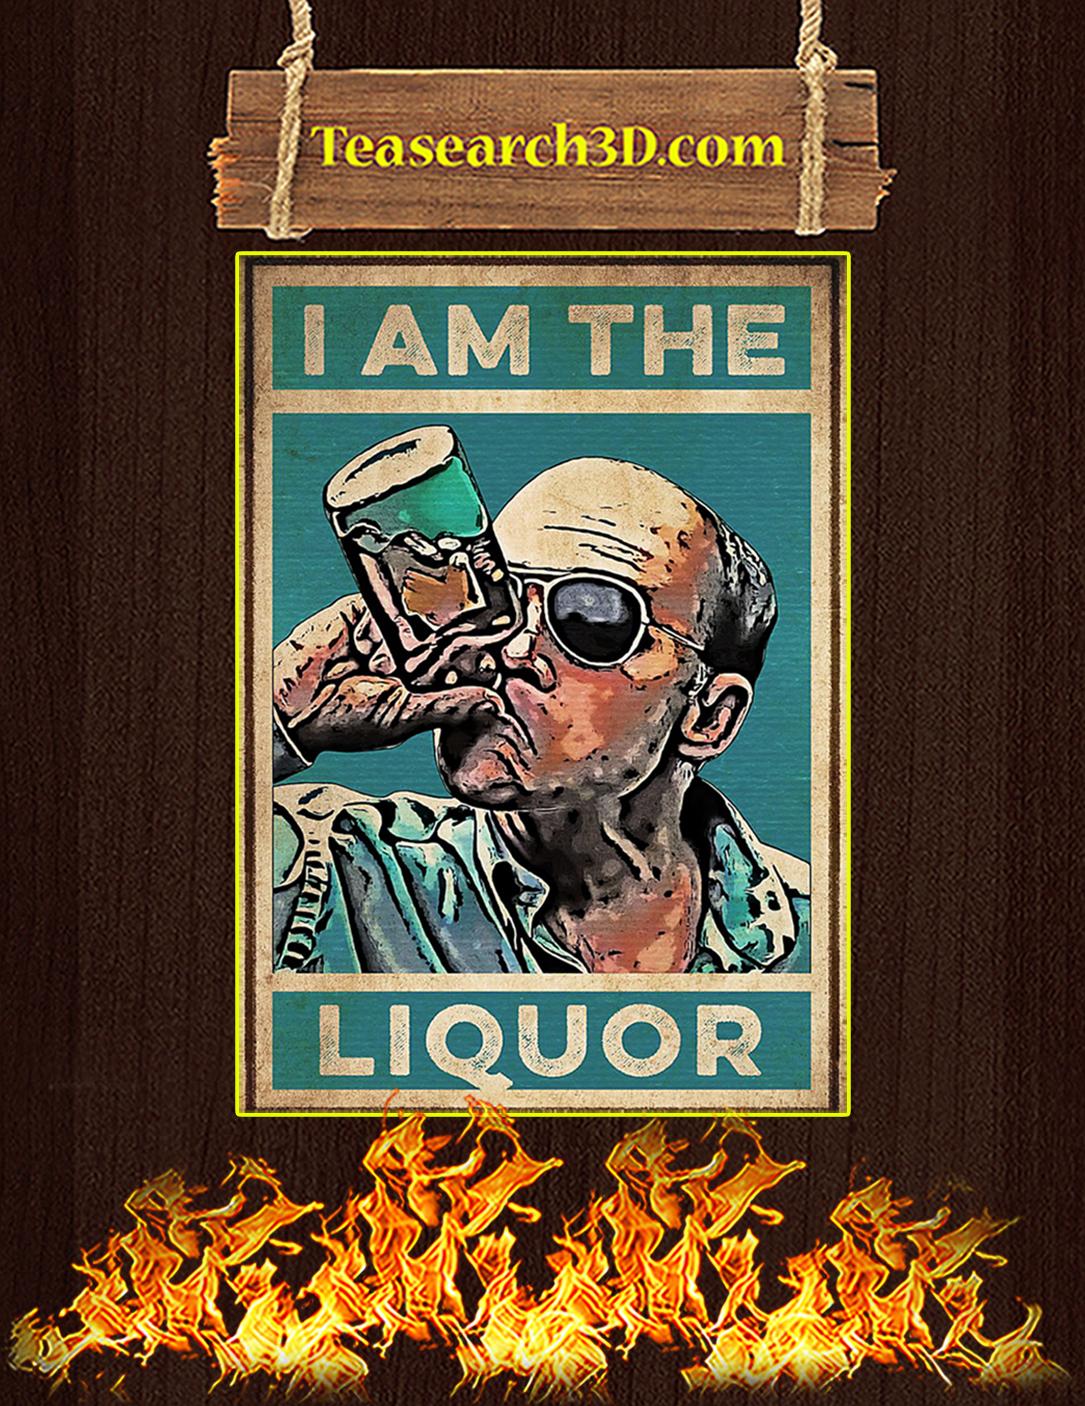 I am the liquor poster A2